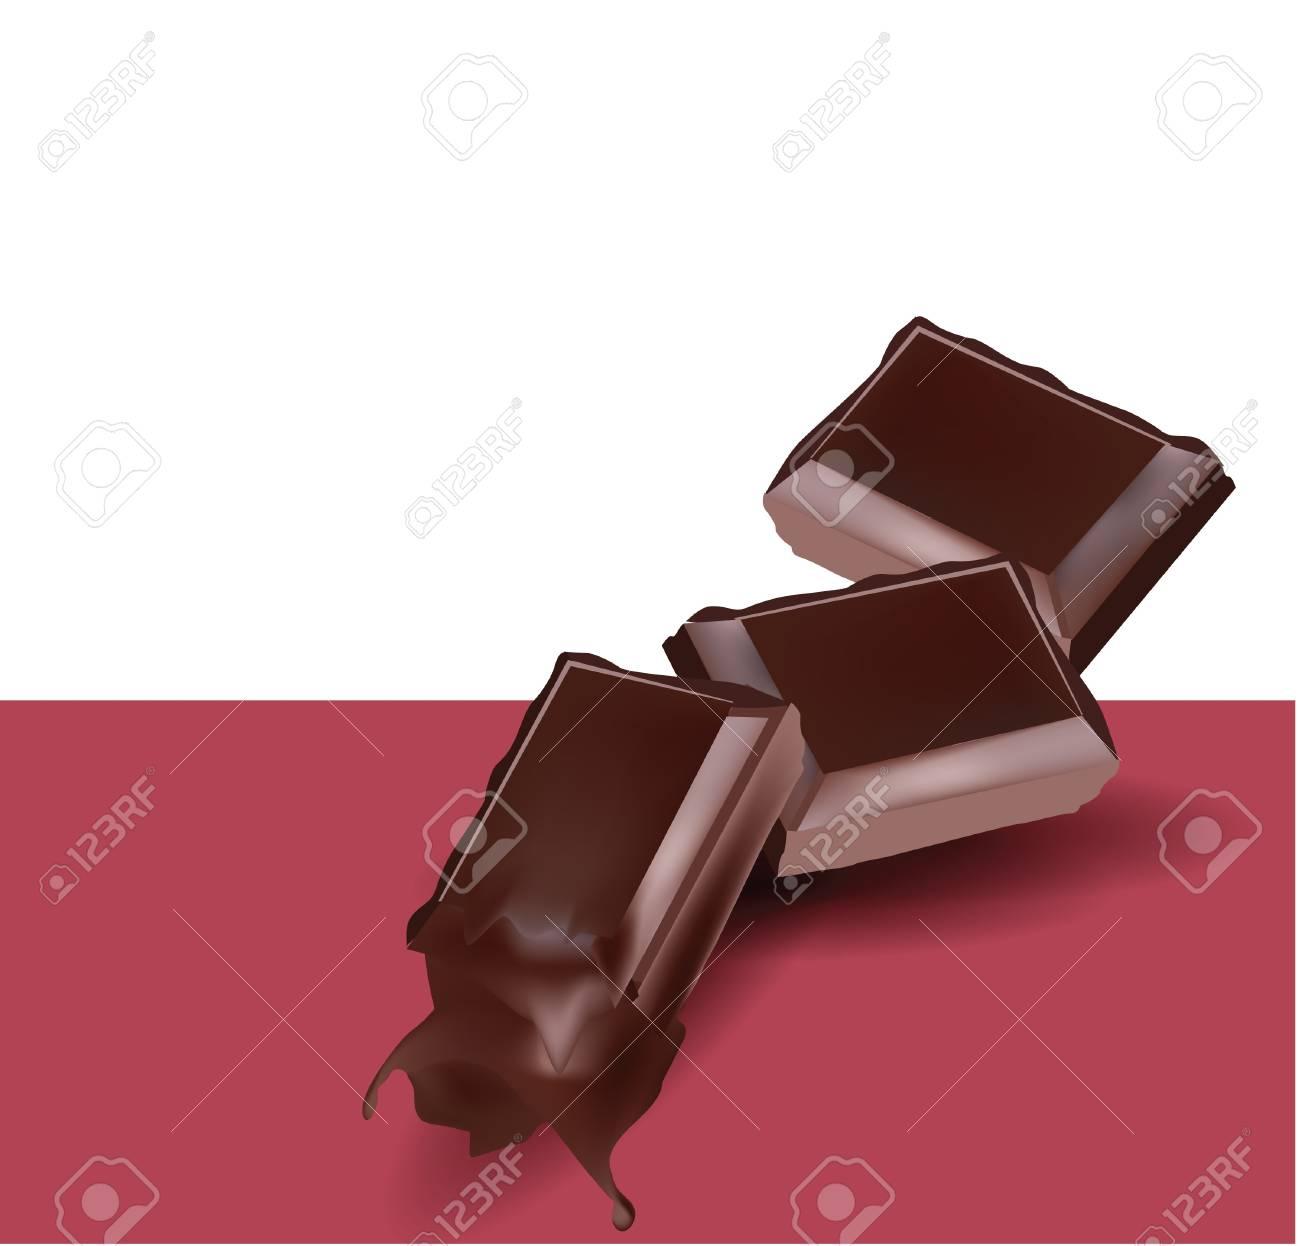 chocolate Stock Photo - 11648122